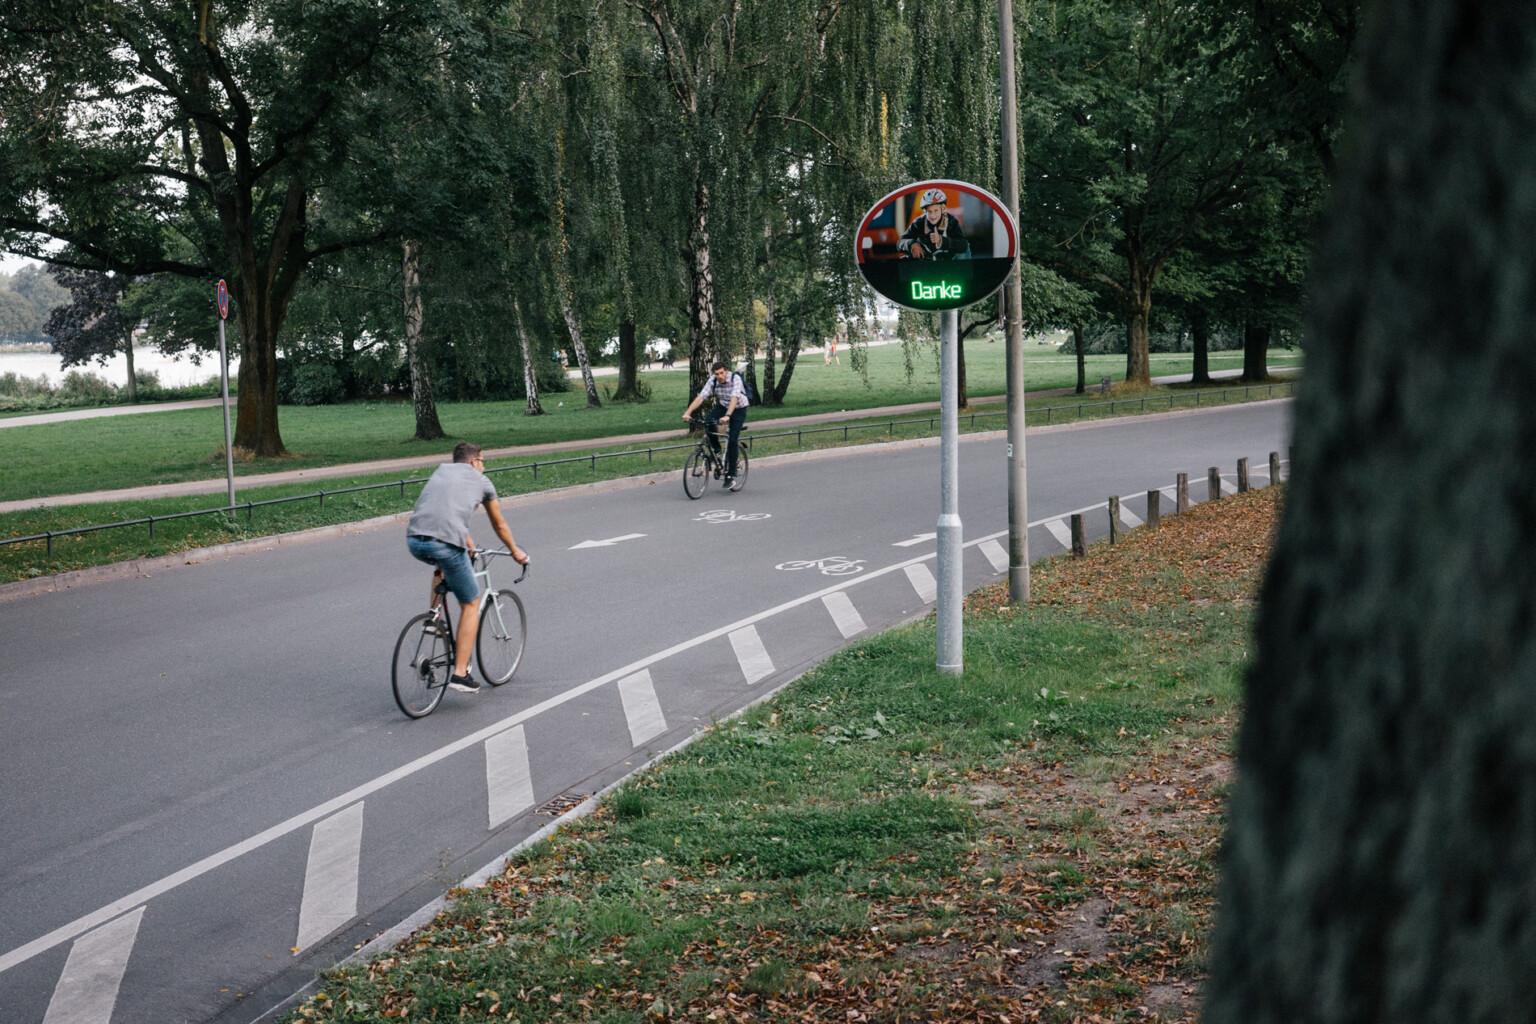 danke_fahrradstrasse-hamburg_radpropaganda_dsc08425